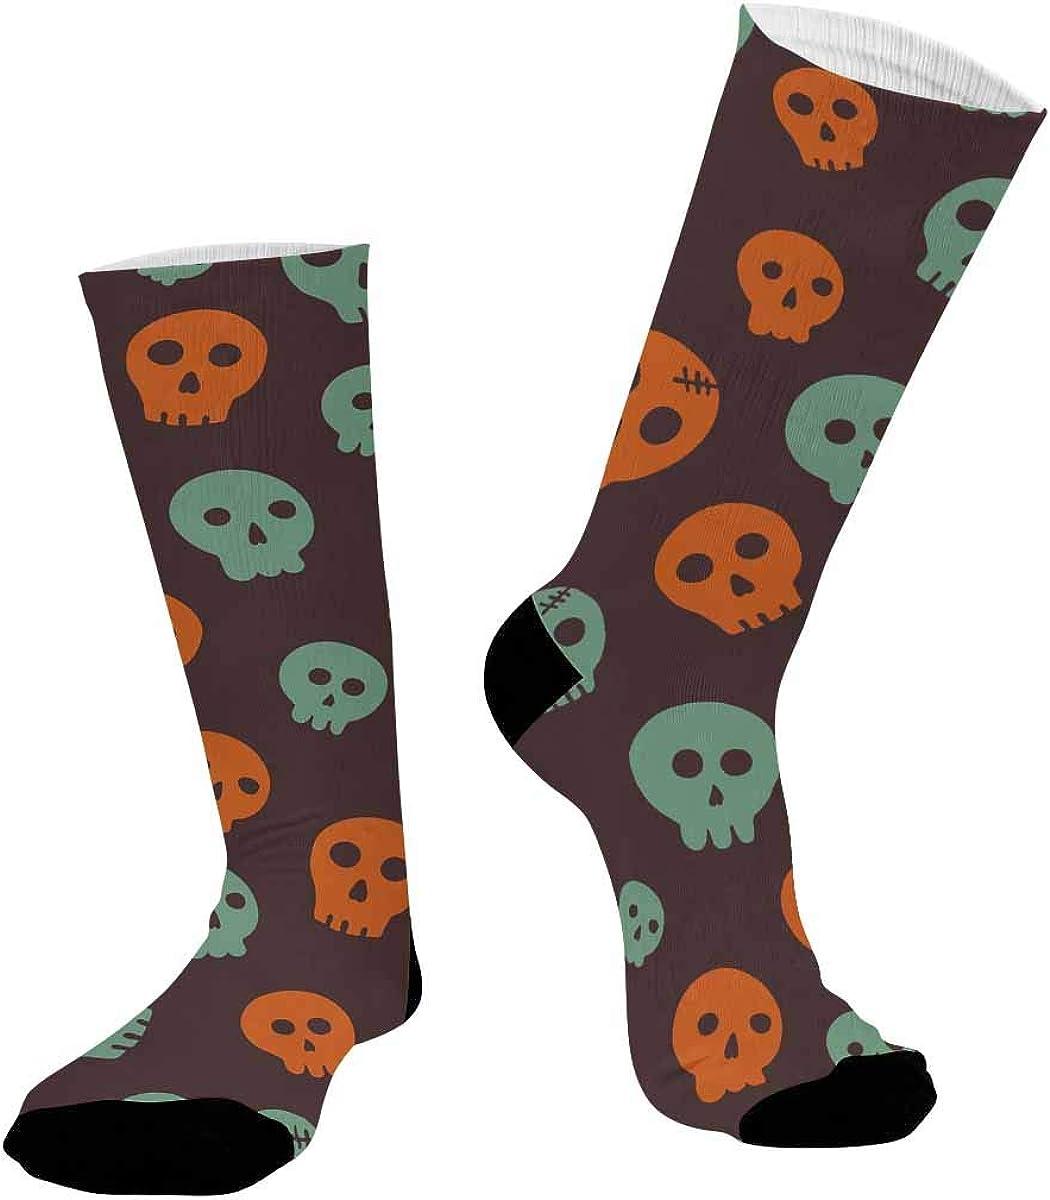 INTERESTPRINT Unisex Running Hiking Dress Athletic Crew Socks Halloween Skull